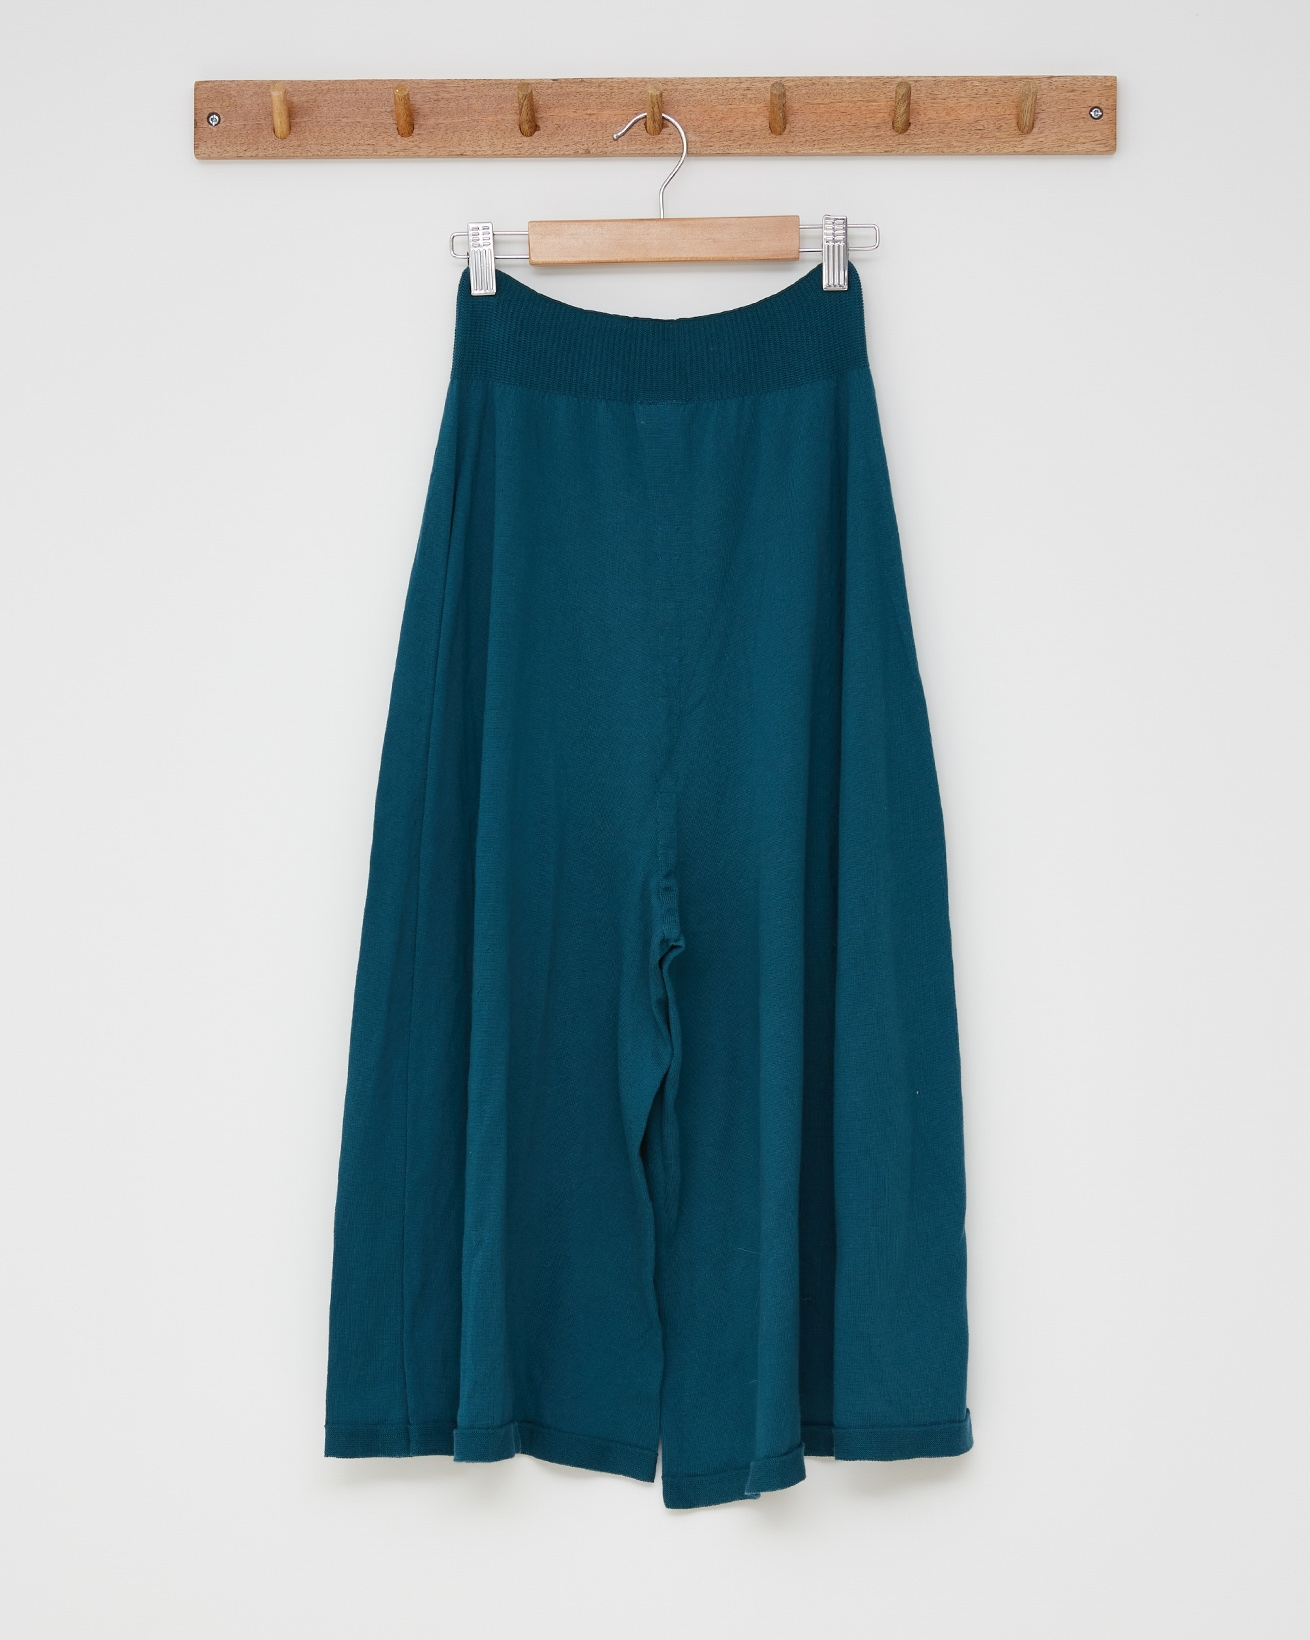 Organic cotton culottes - Size Small - Icelandic blue - 2591